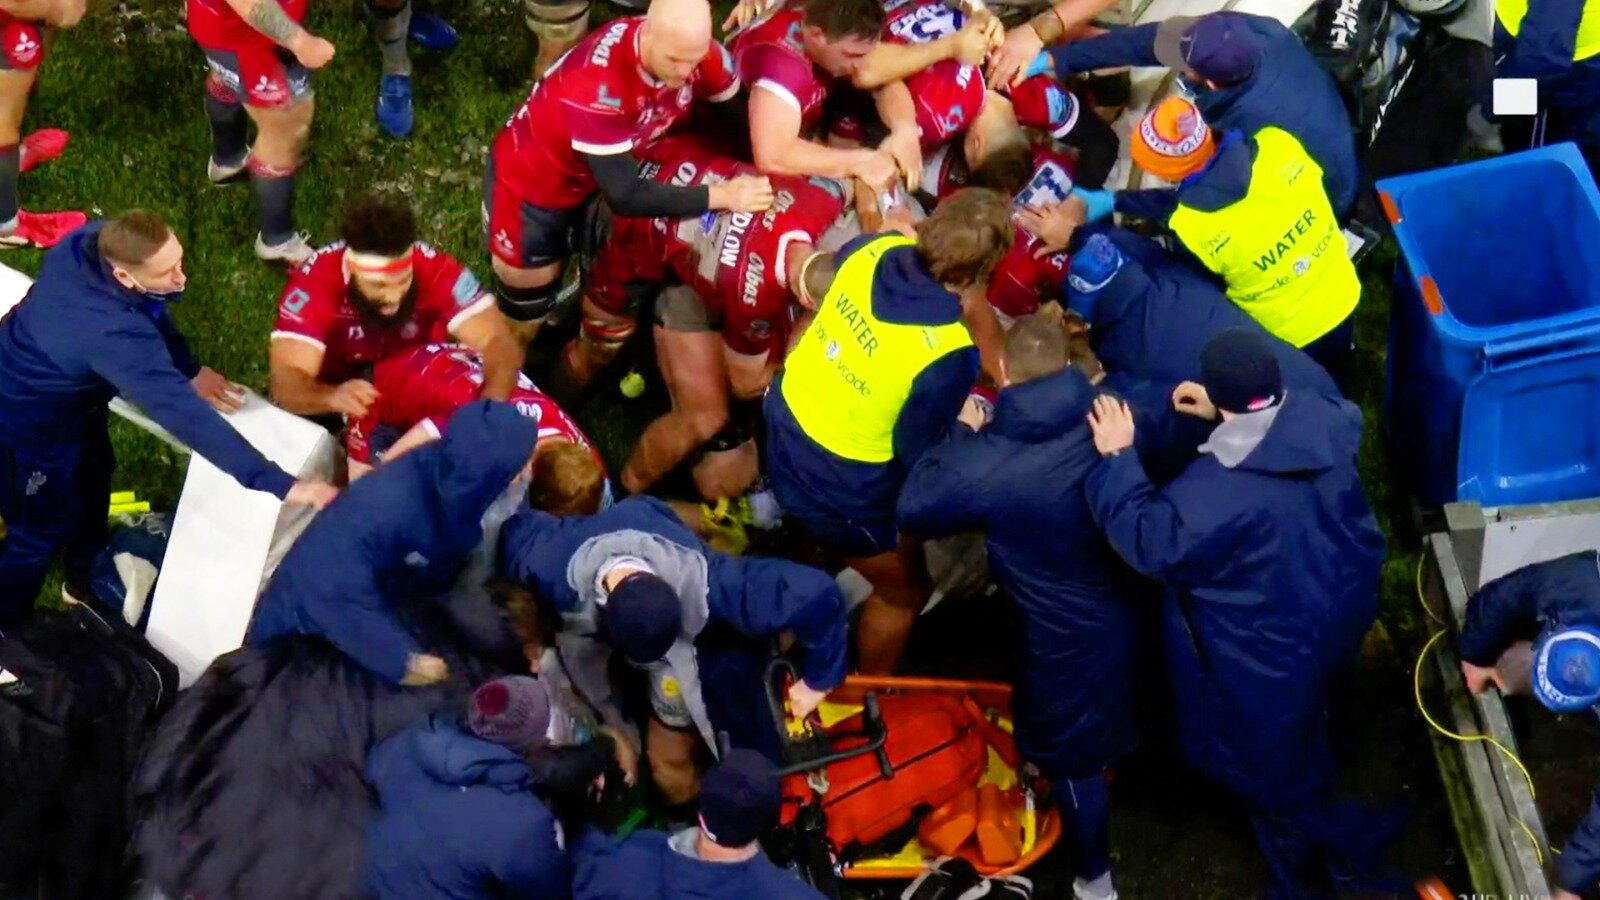 Chaos at Kingsholm as water boy sparks mass brawl in shocking Premiership scenes